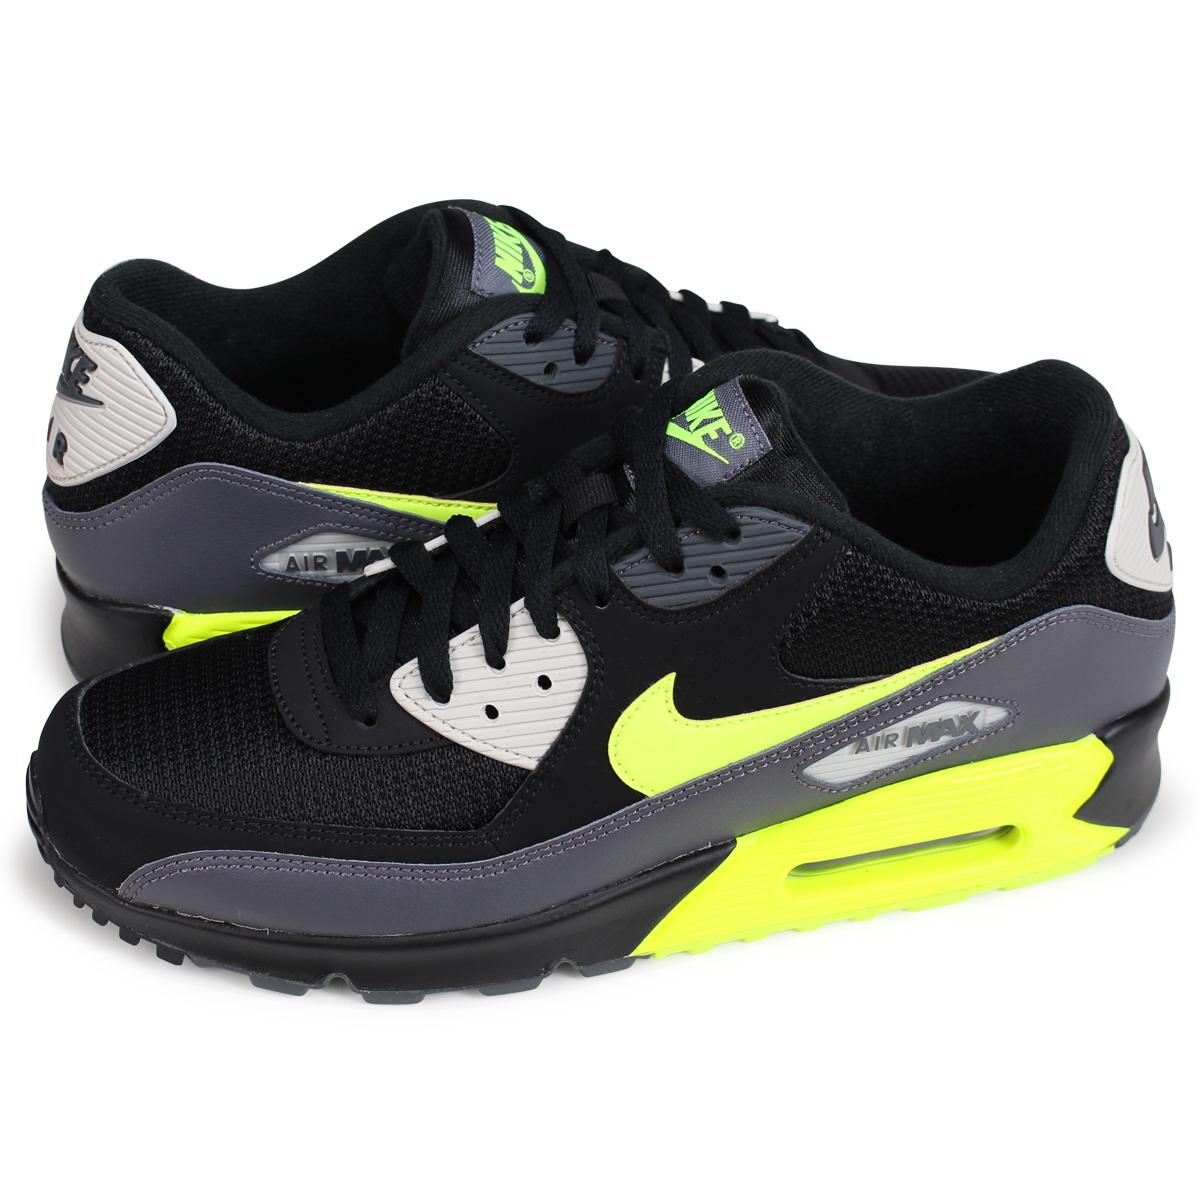 2019 Nike Air Max 90 Essential Dark GreyVoltBlackBone Running Shoes AJ1285 015